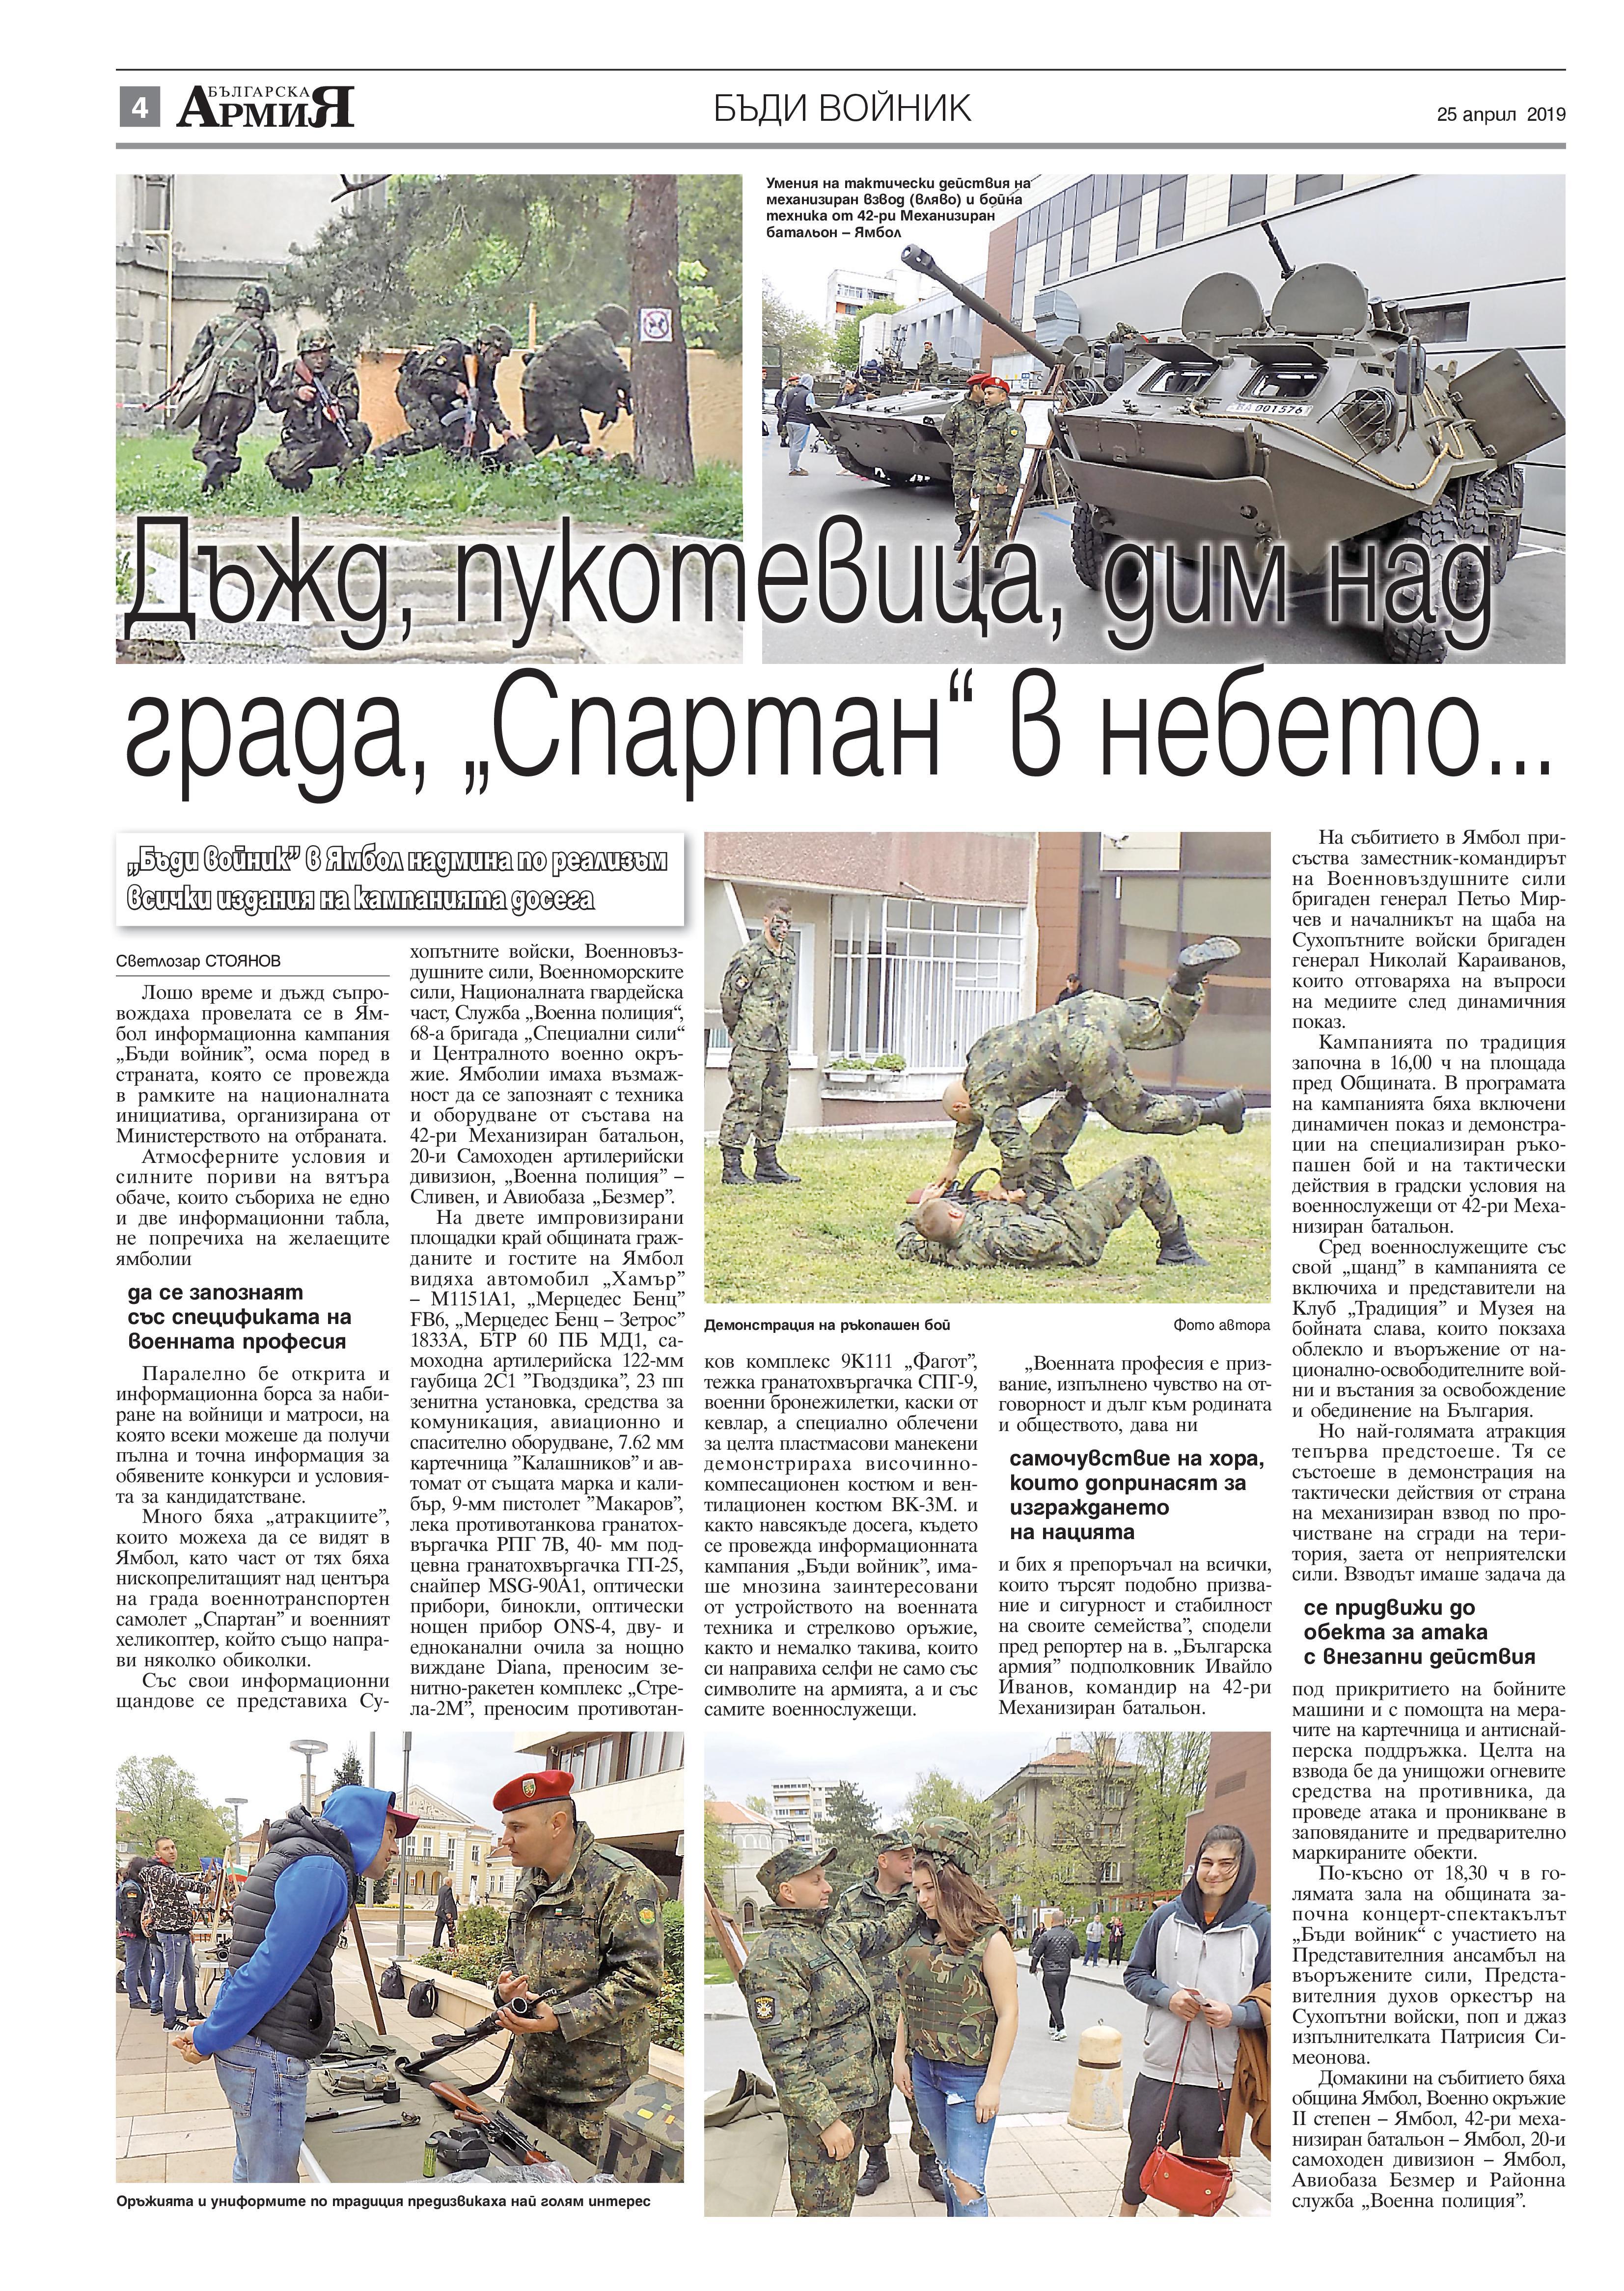 https://armymedia.bg/wp-content/uploads/2015/06/04-27.jpg